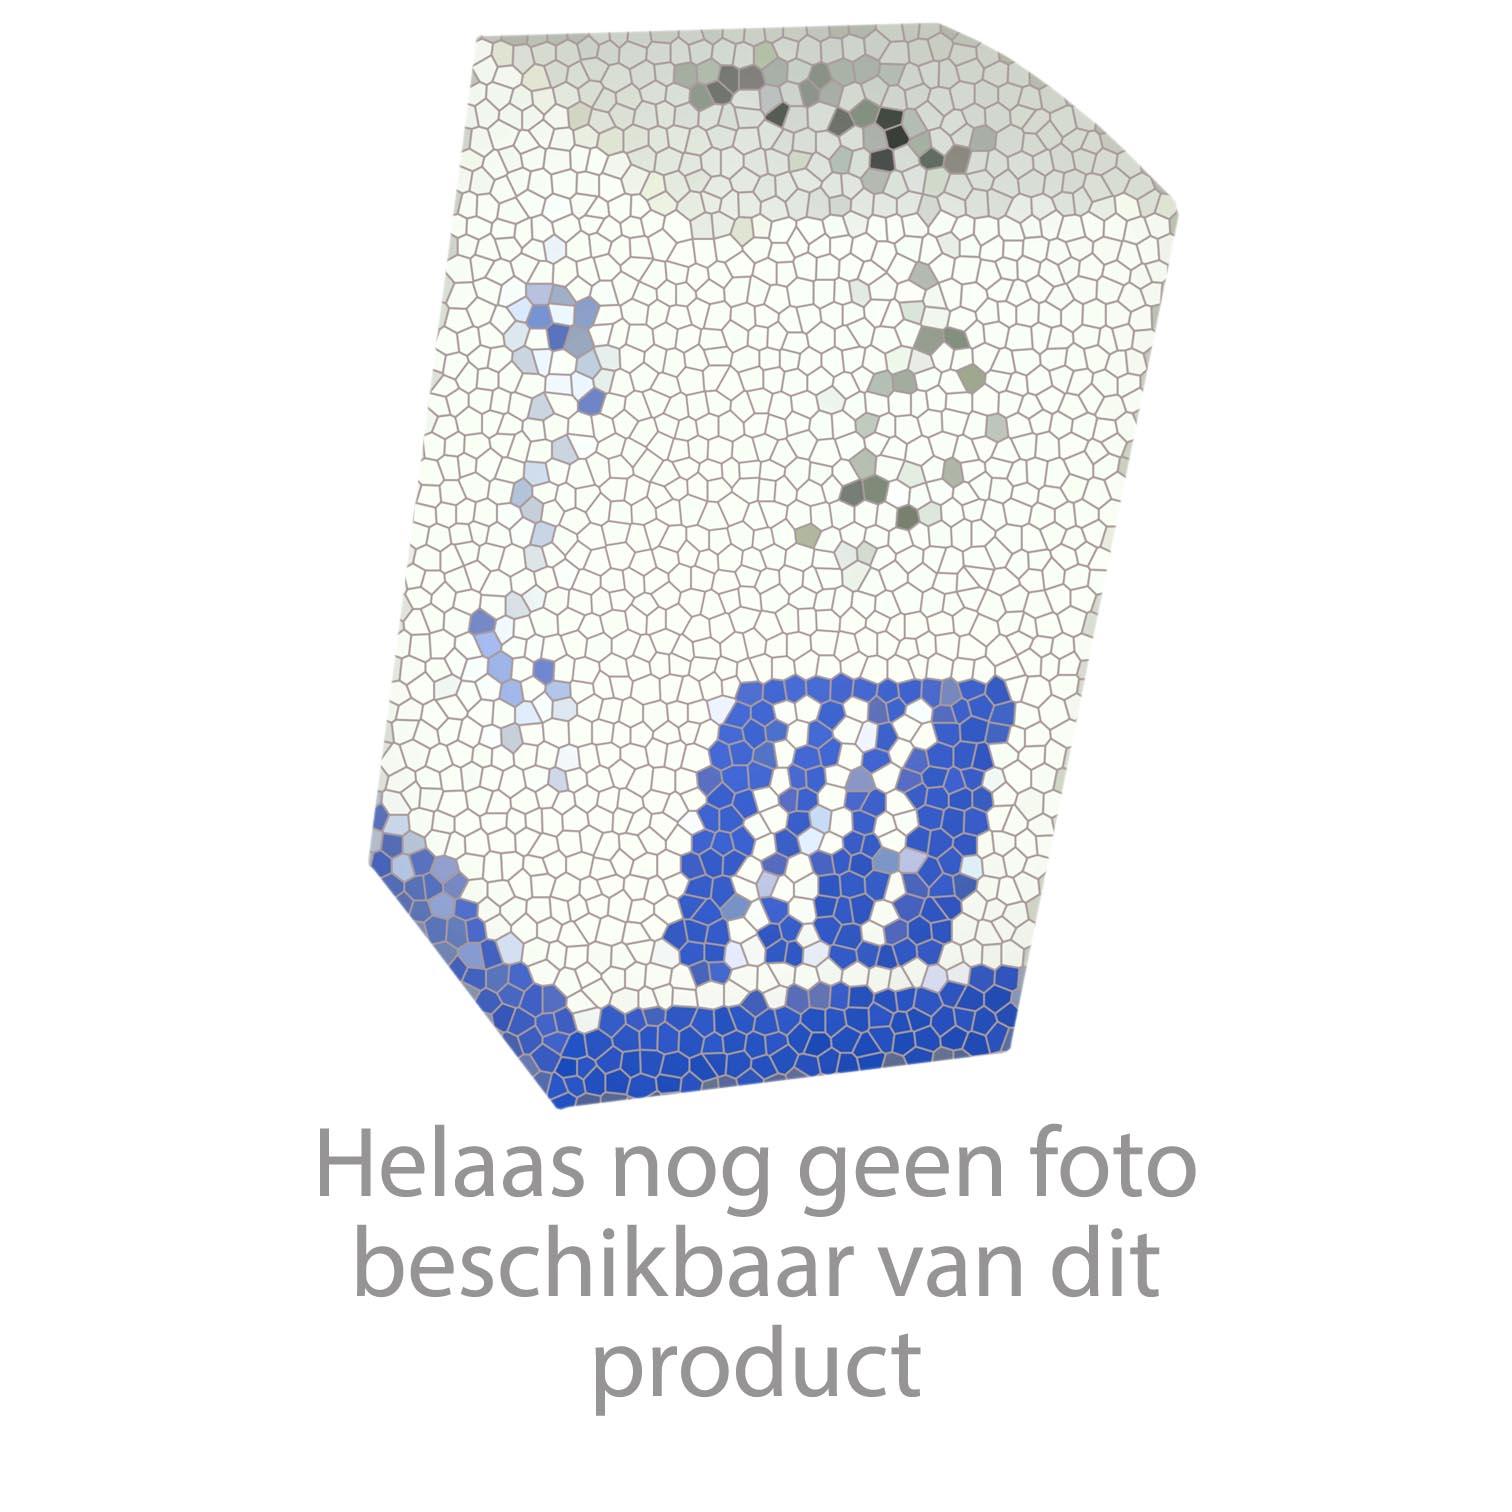 Fabulous Grohe Concetto Keukenkraan Onderdelen Information and Ideas - Herz UG67